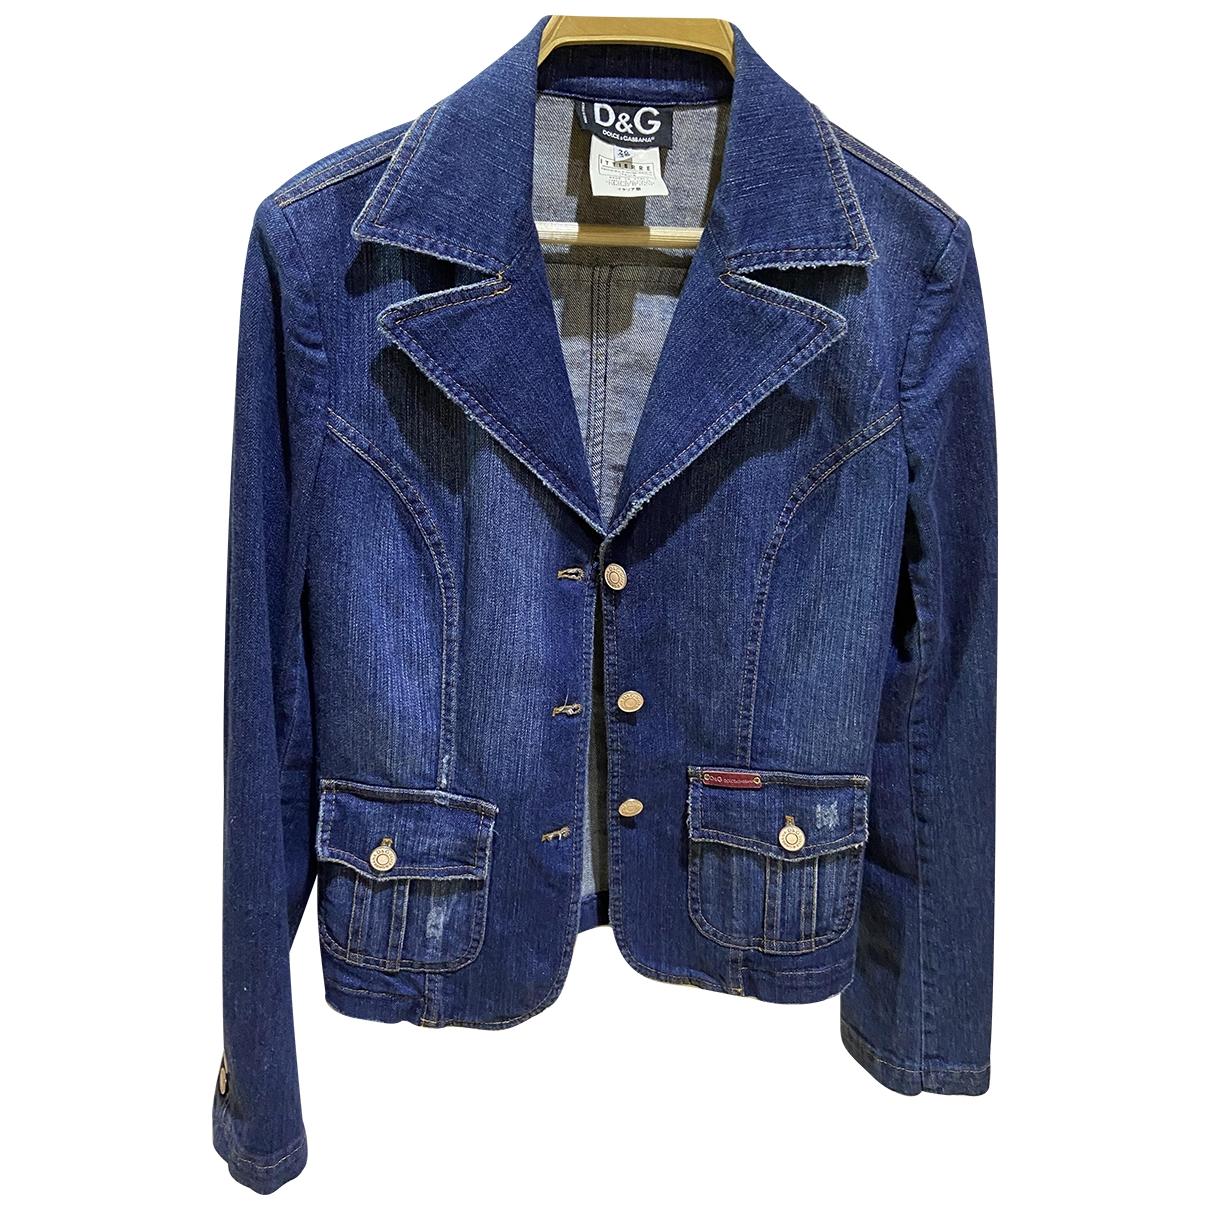 D&g \N Jacke in  Blau Denim - Jeans